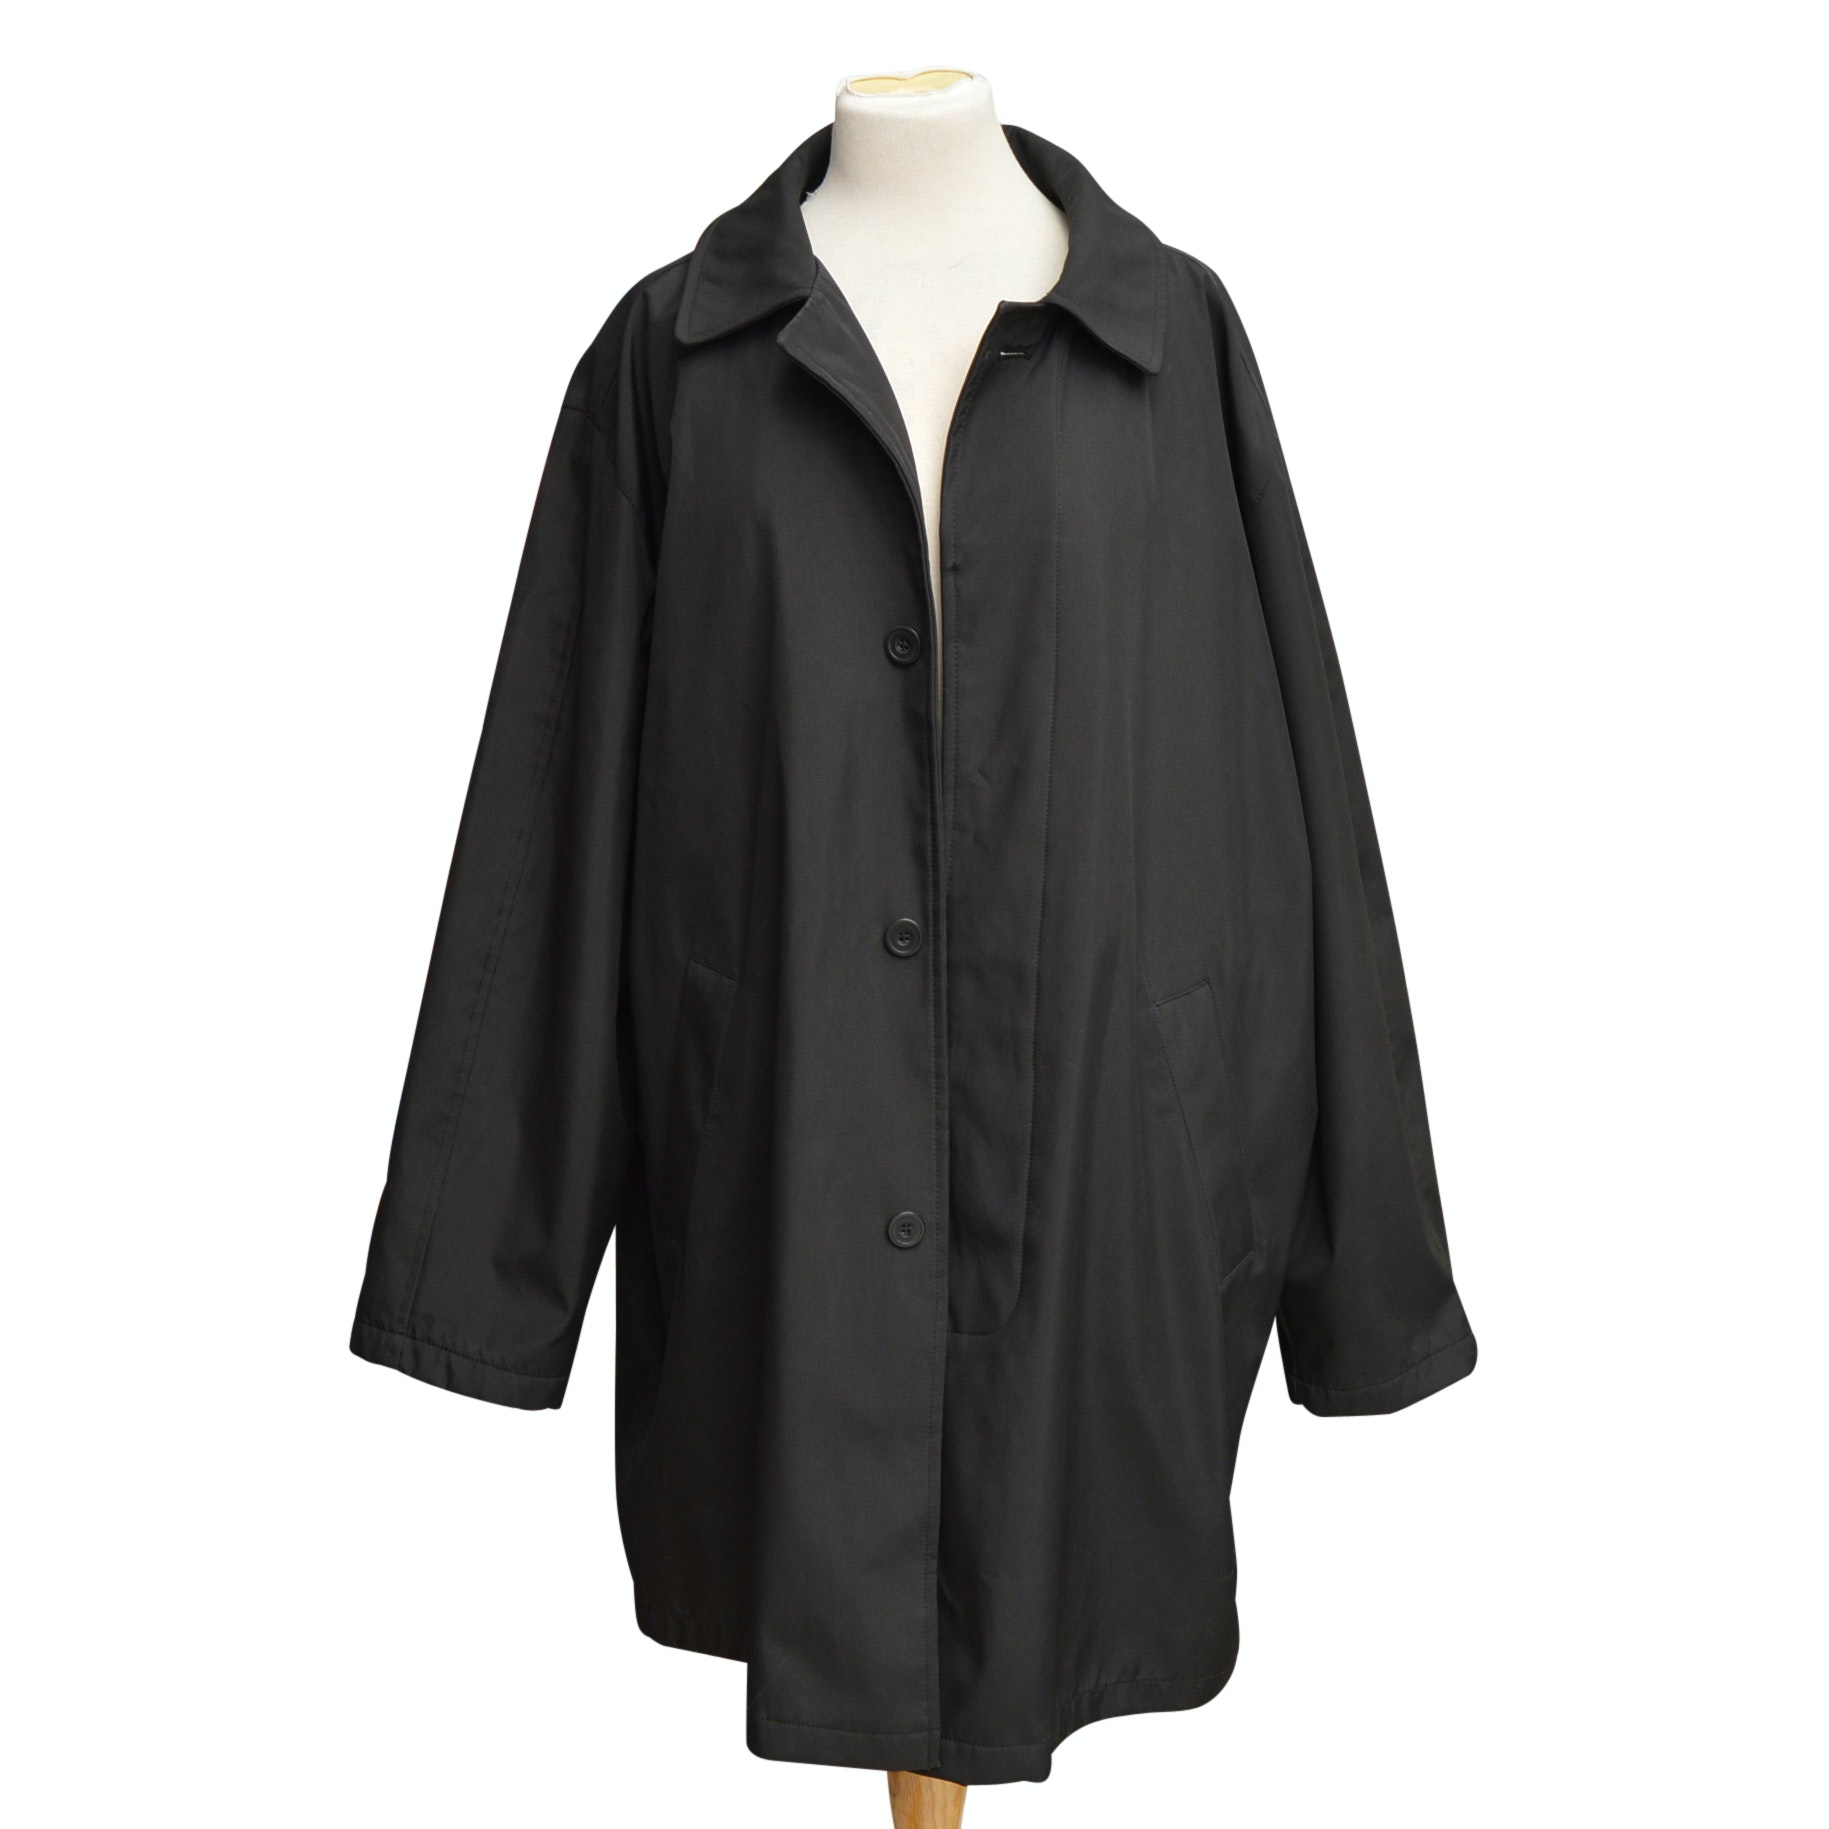 Women's Studio ALX All Weather Coat